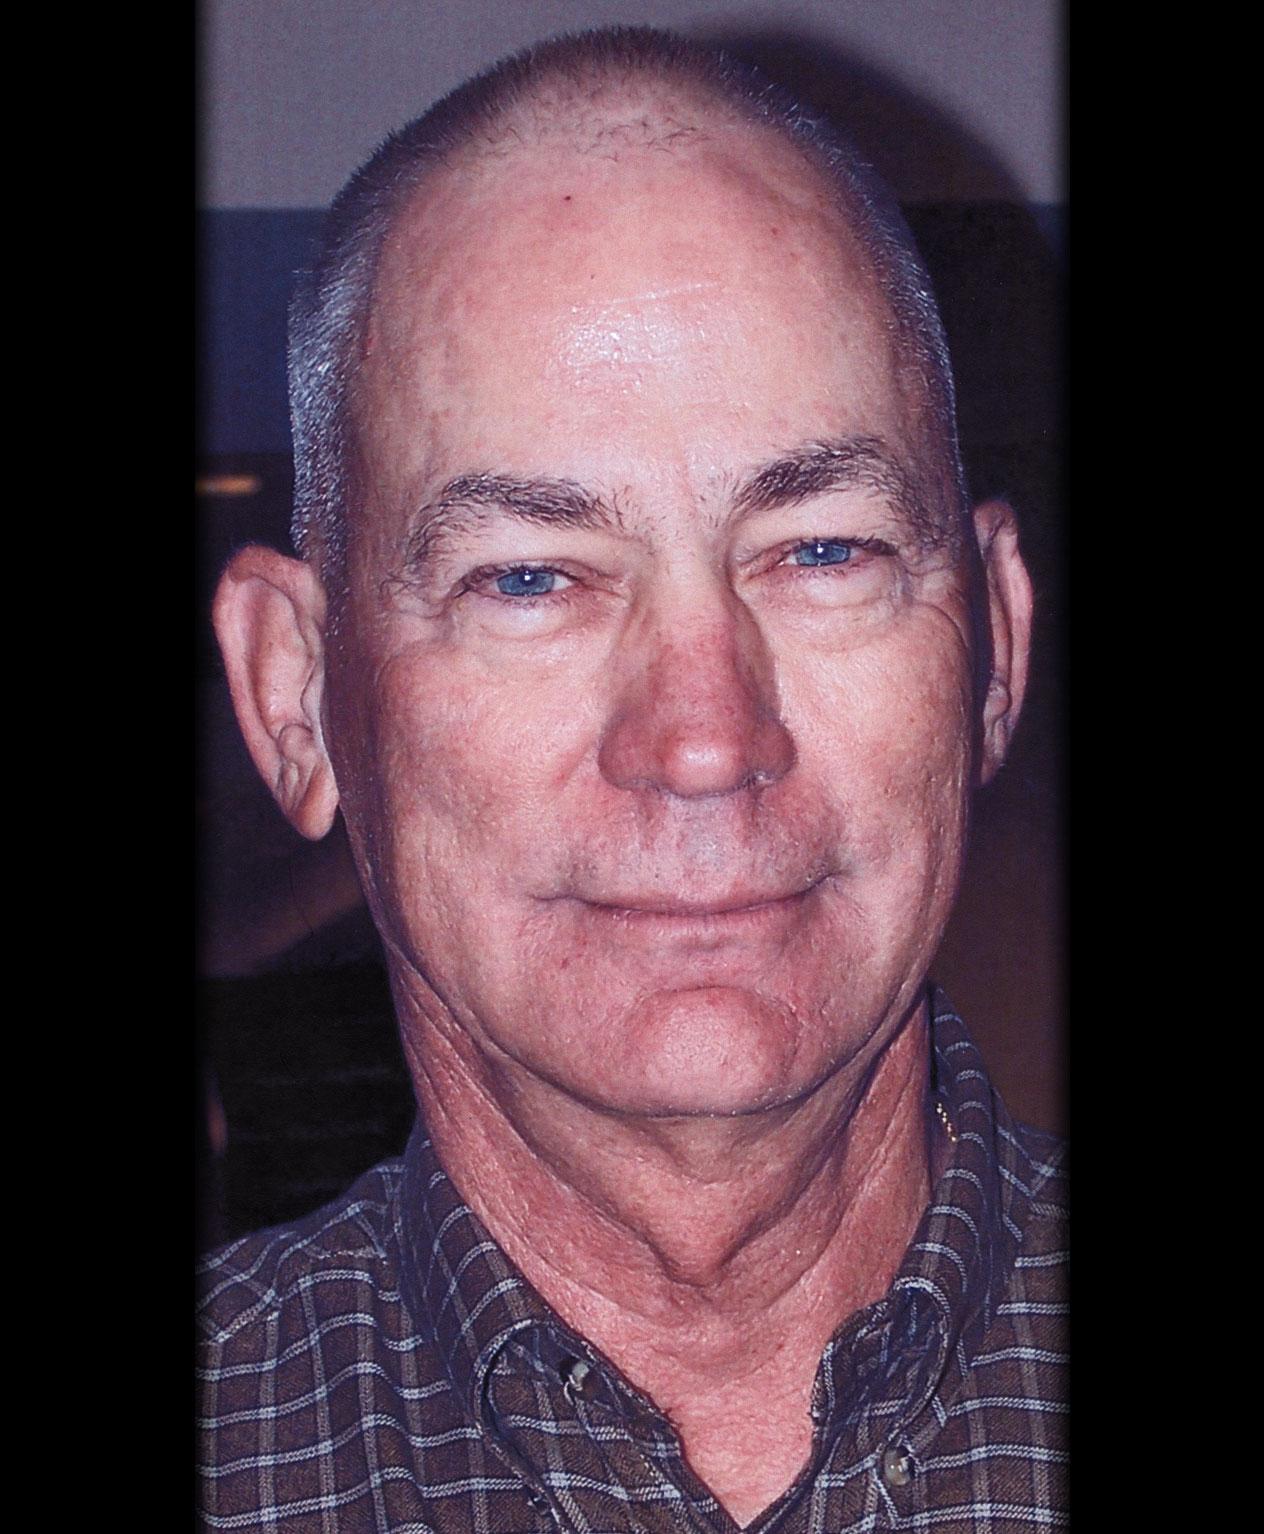 Roll of Honor - Dr. David R. Jones, IV